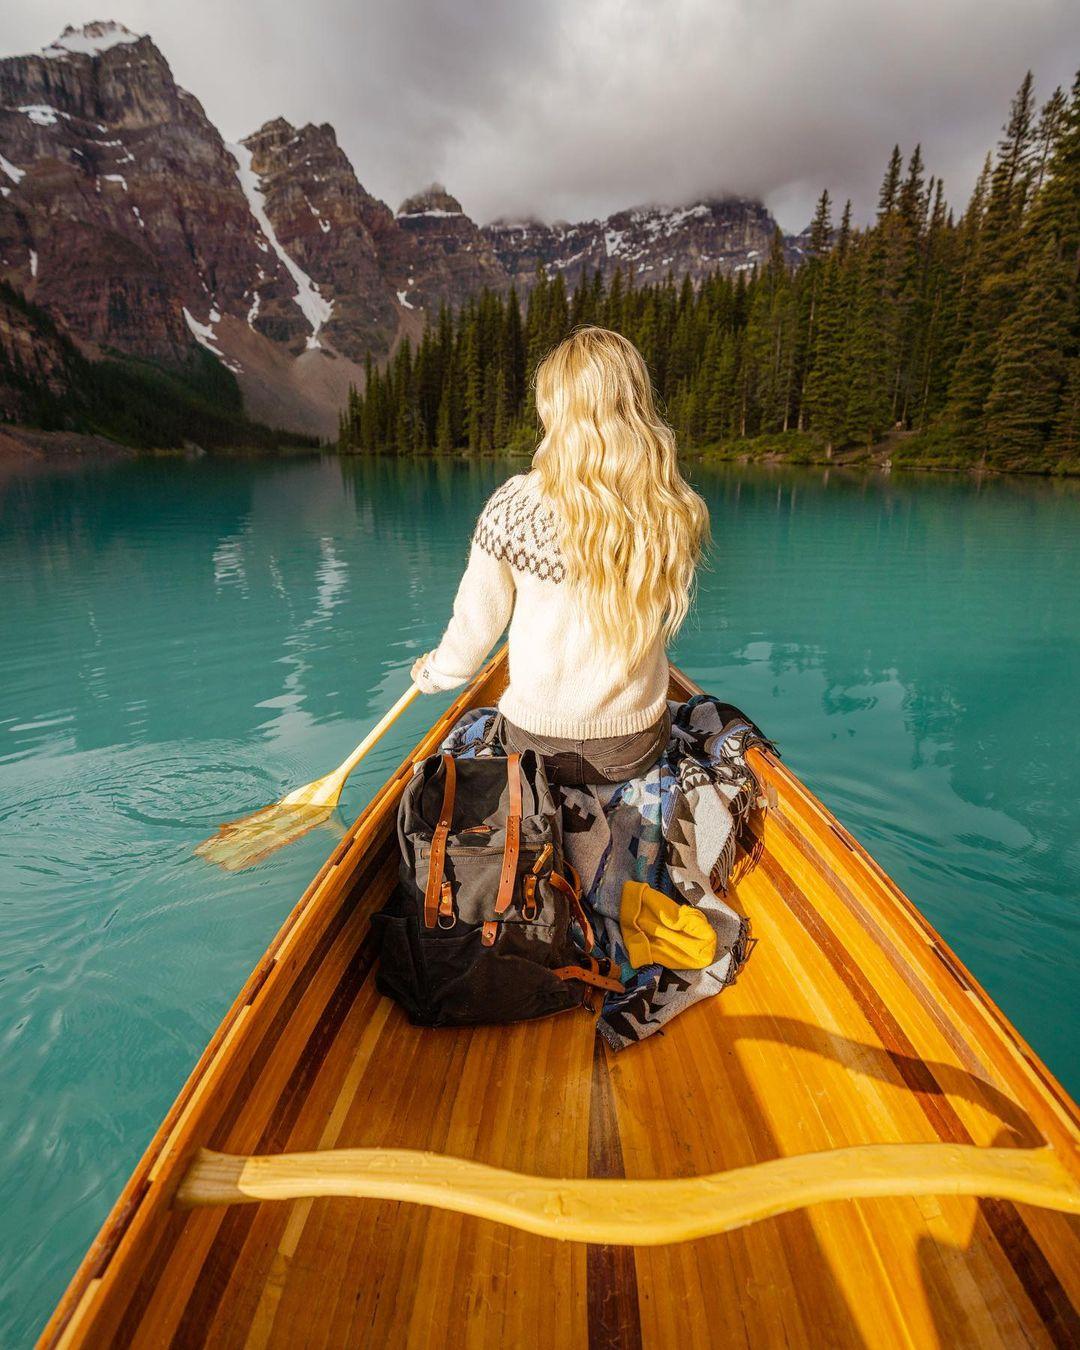 Природа и путешествия на снимках Брэйдина Тота